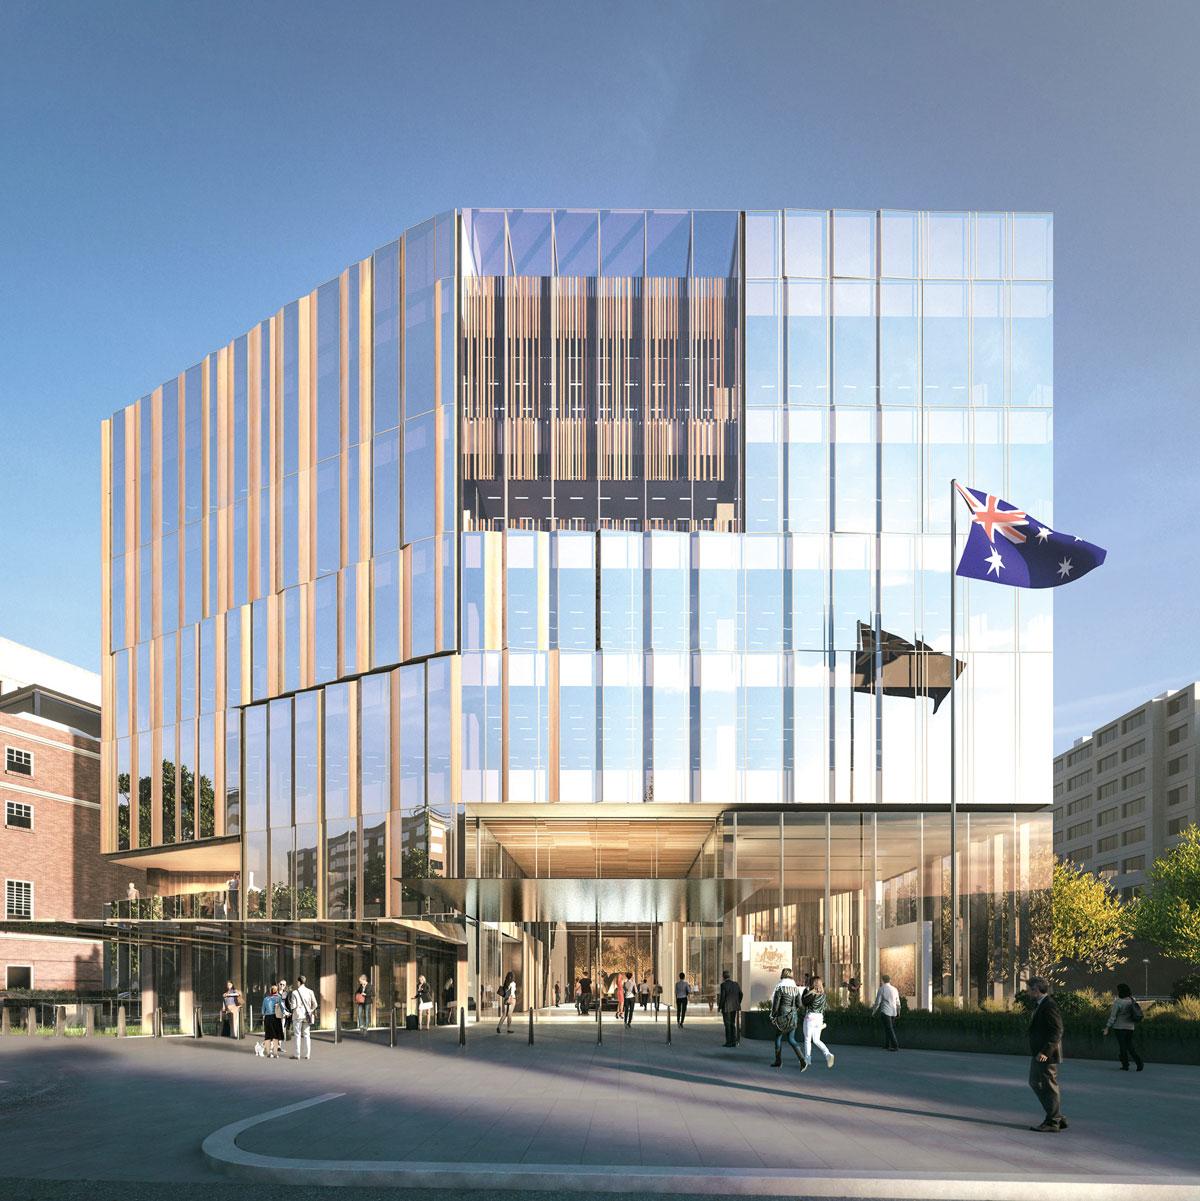 Savremena arhitektura, aluminijum-staklene fasade